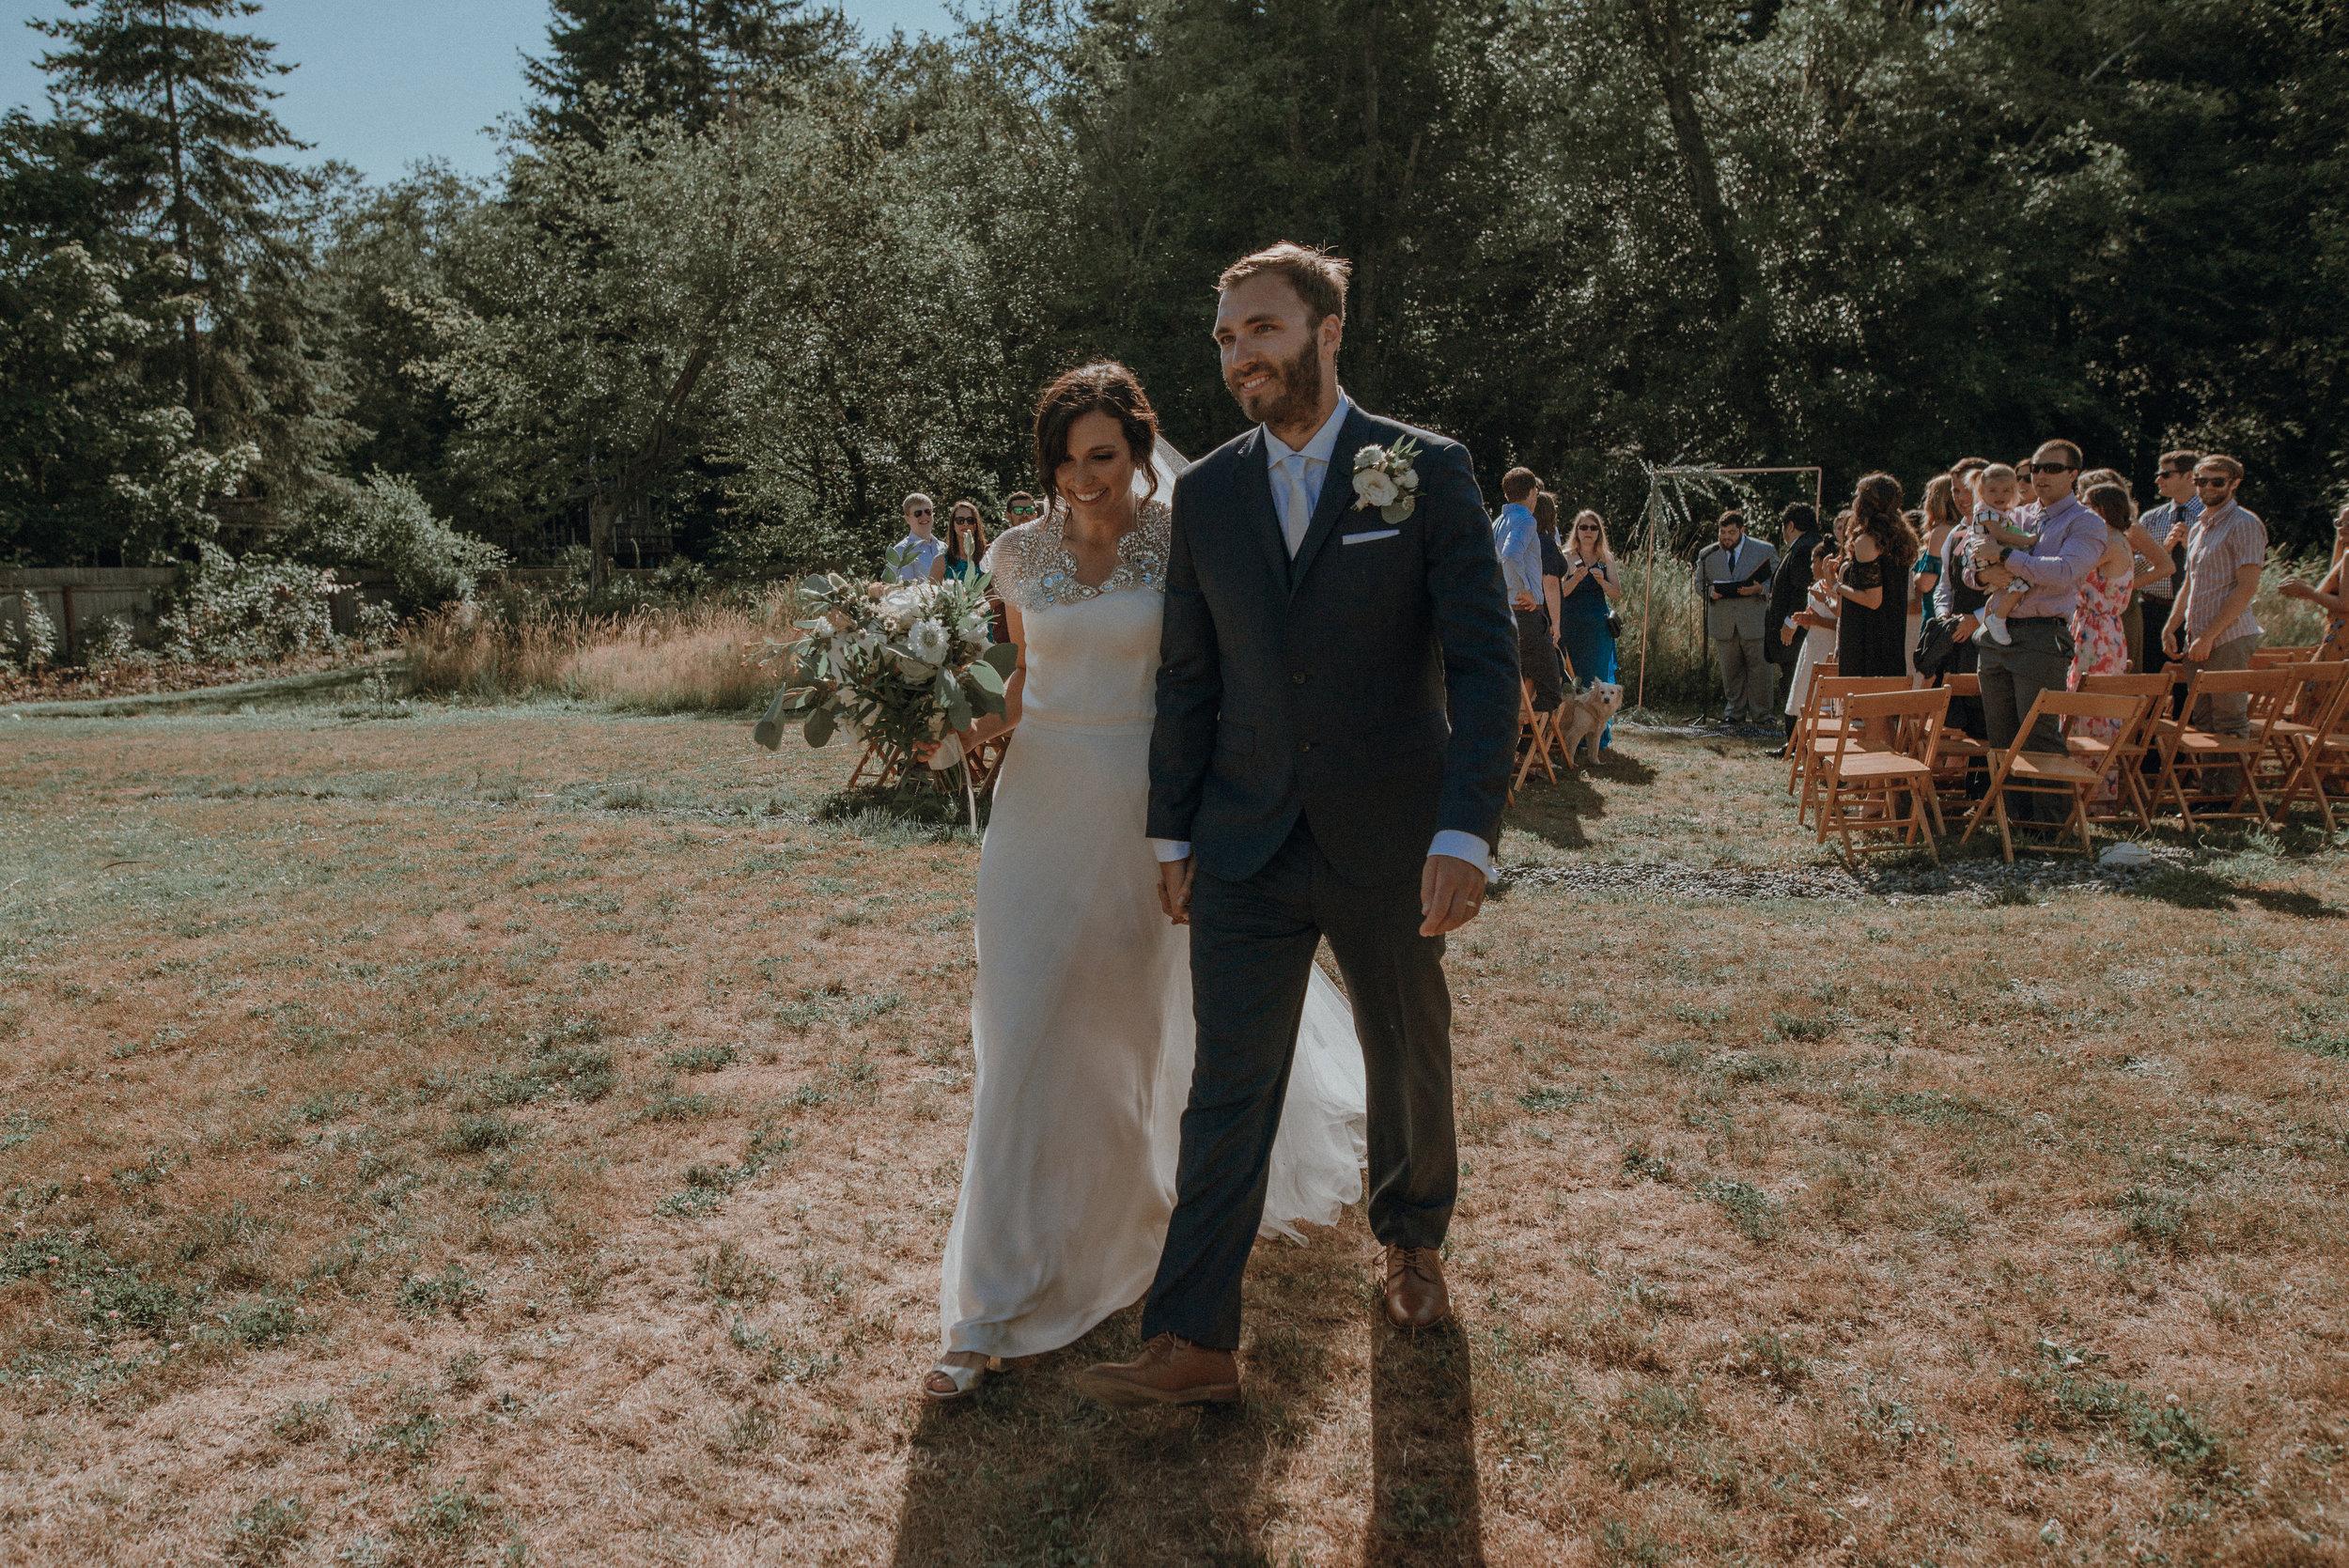 Lodges-at-Vashon-wedding74.jpg